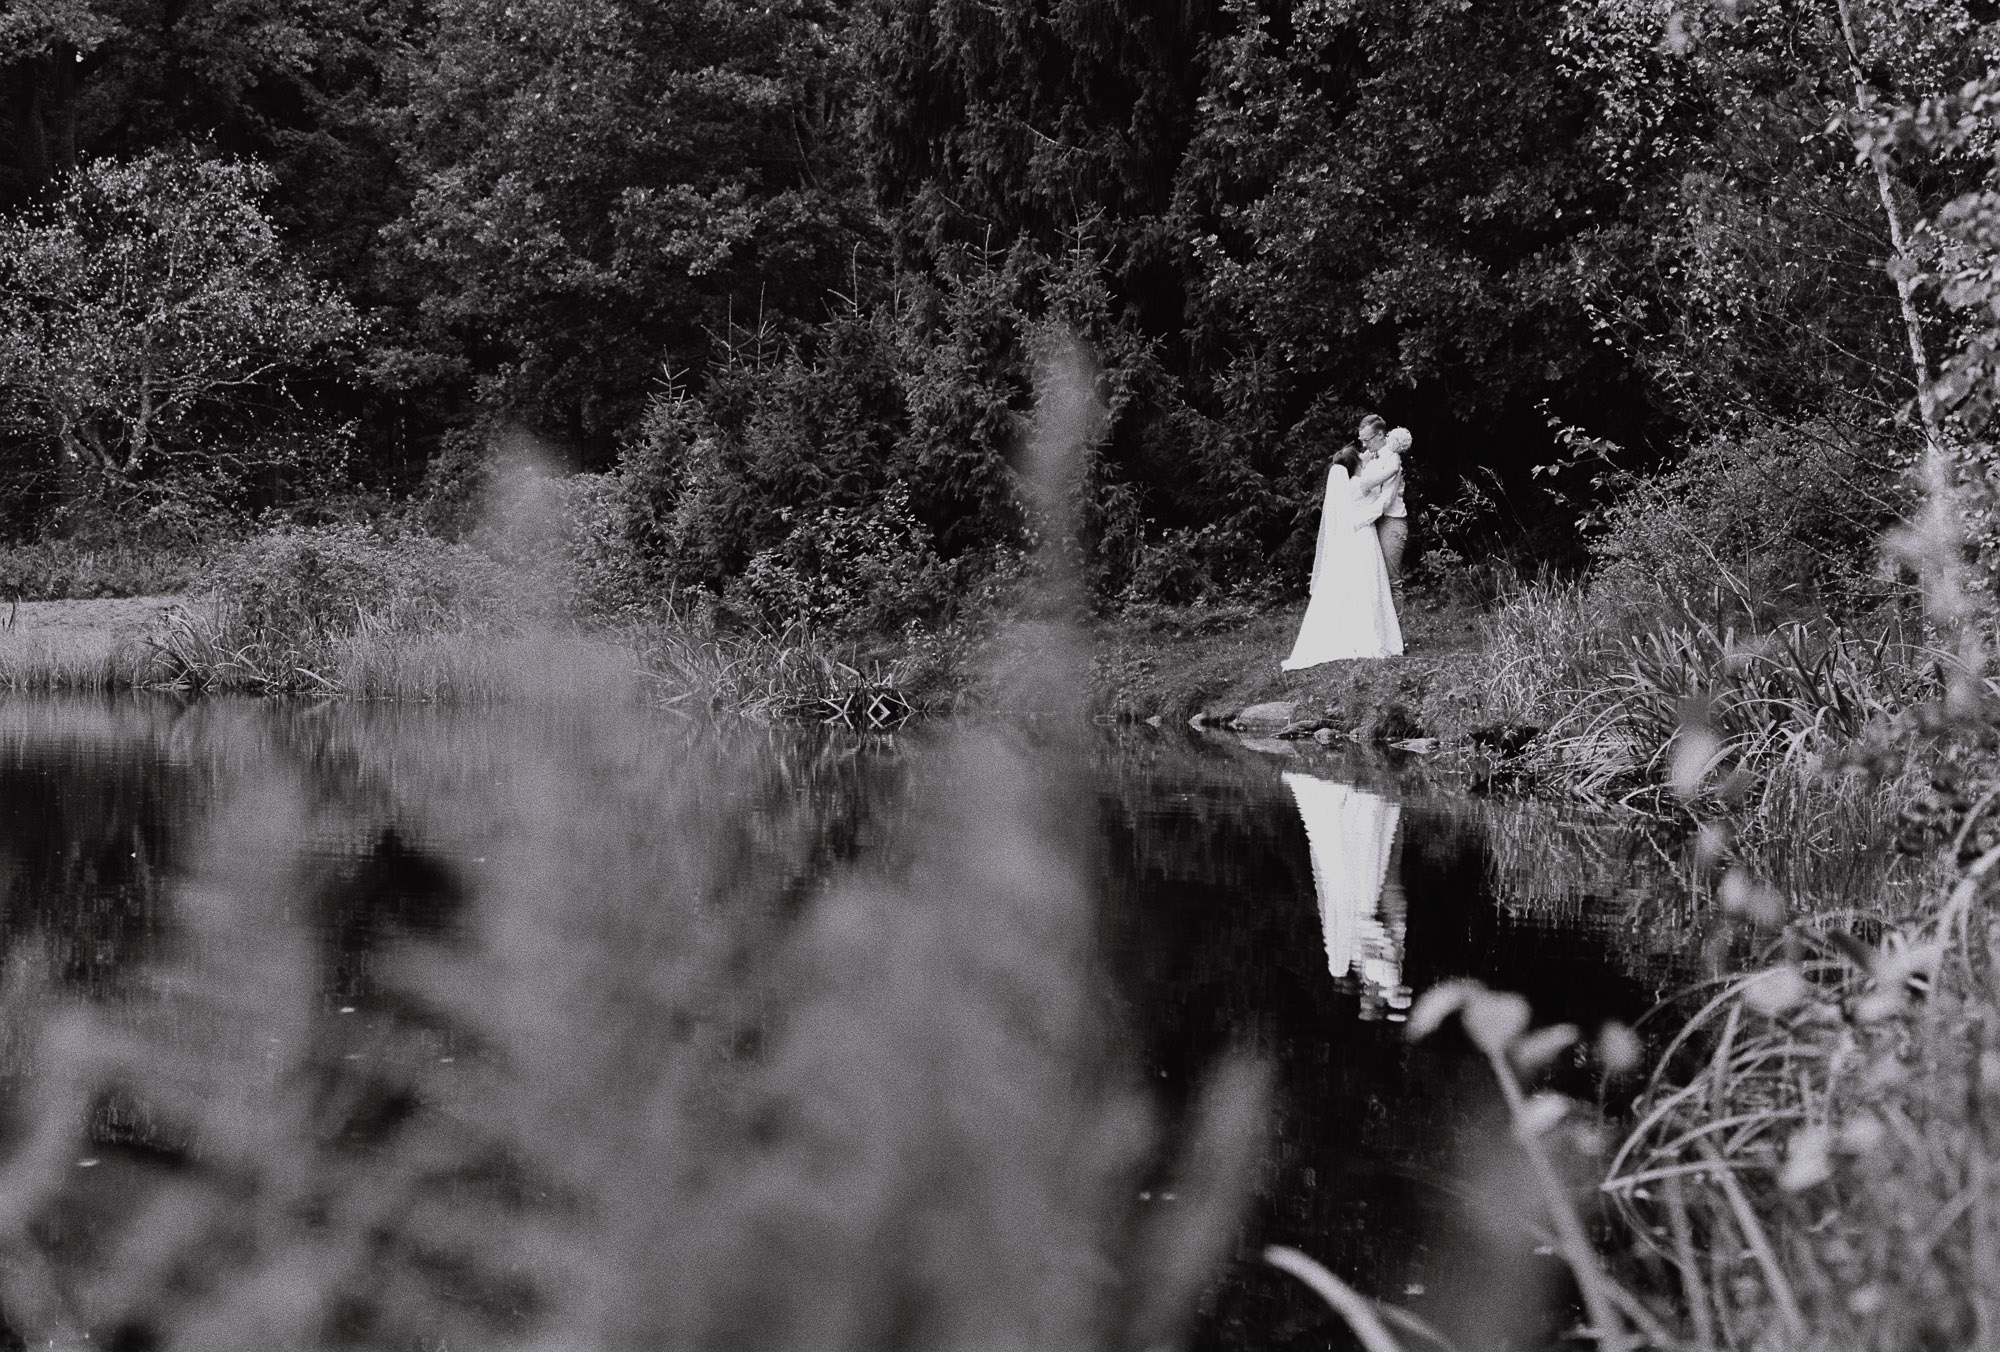 jere-satamo-analog-film-wedding-photographer-finland-101.jpg